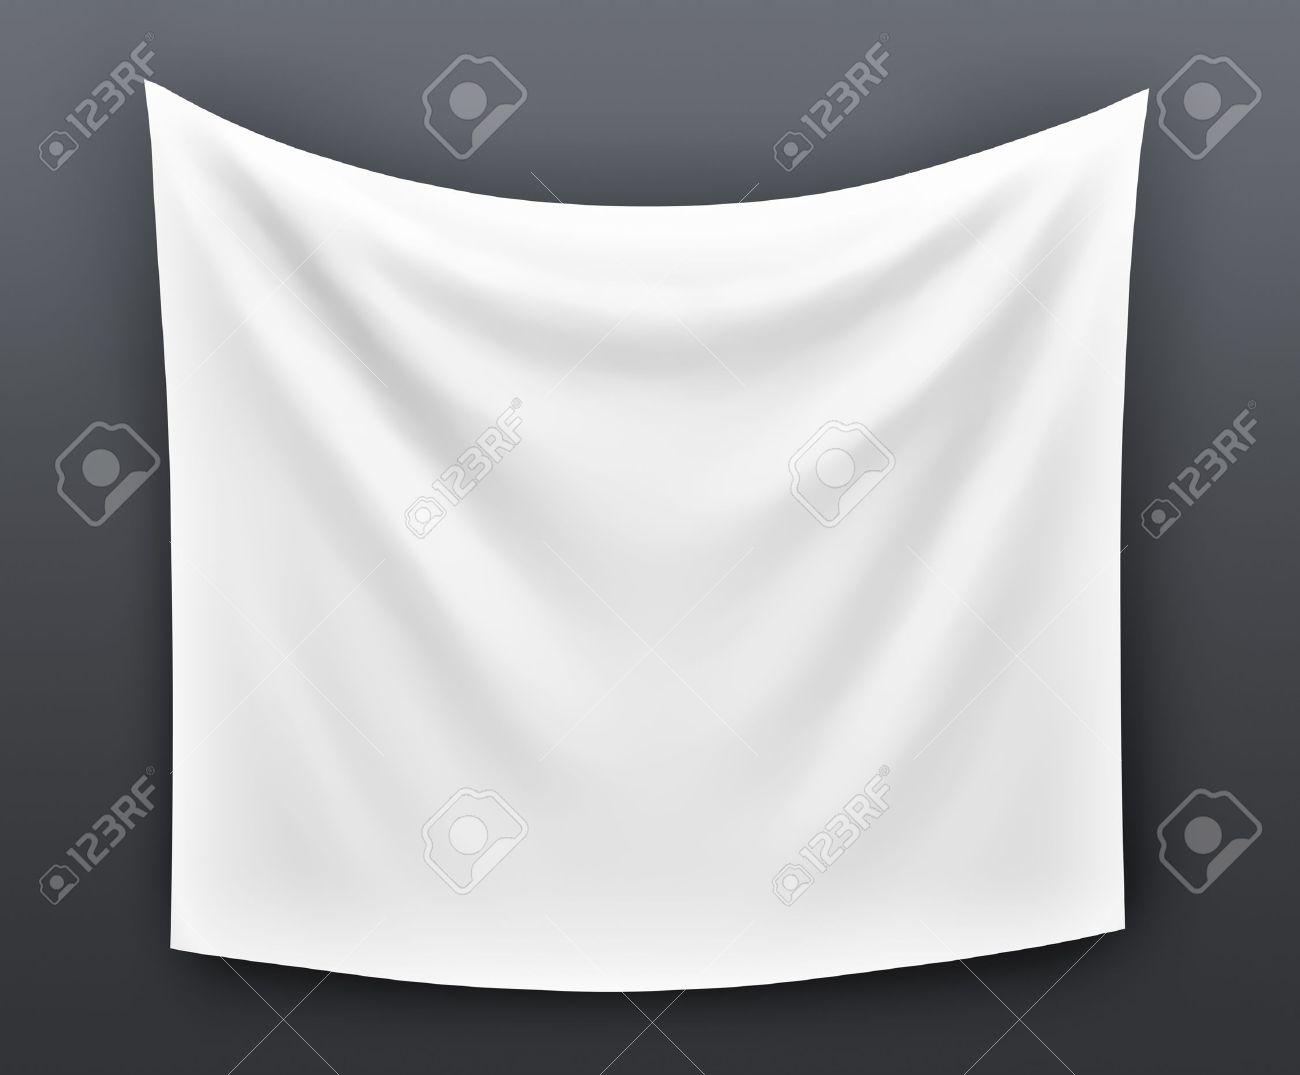 Empty cloth banner. 3d illustration on grey background - 36905763